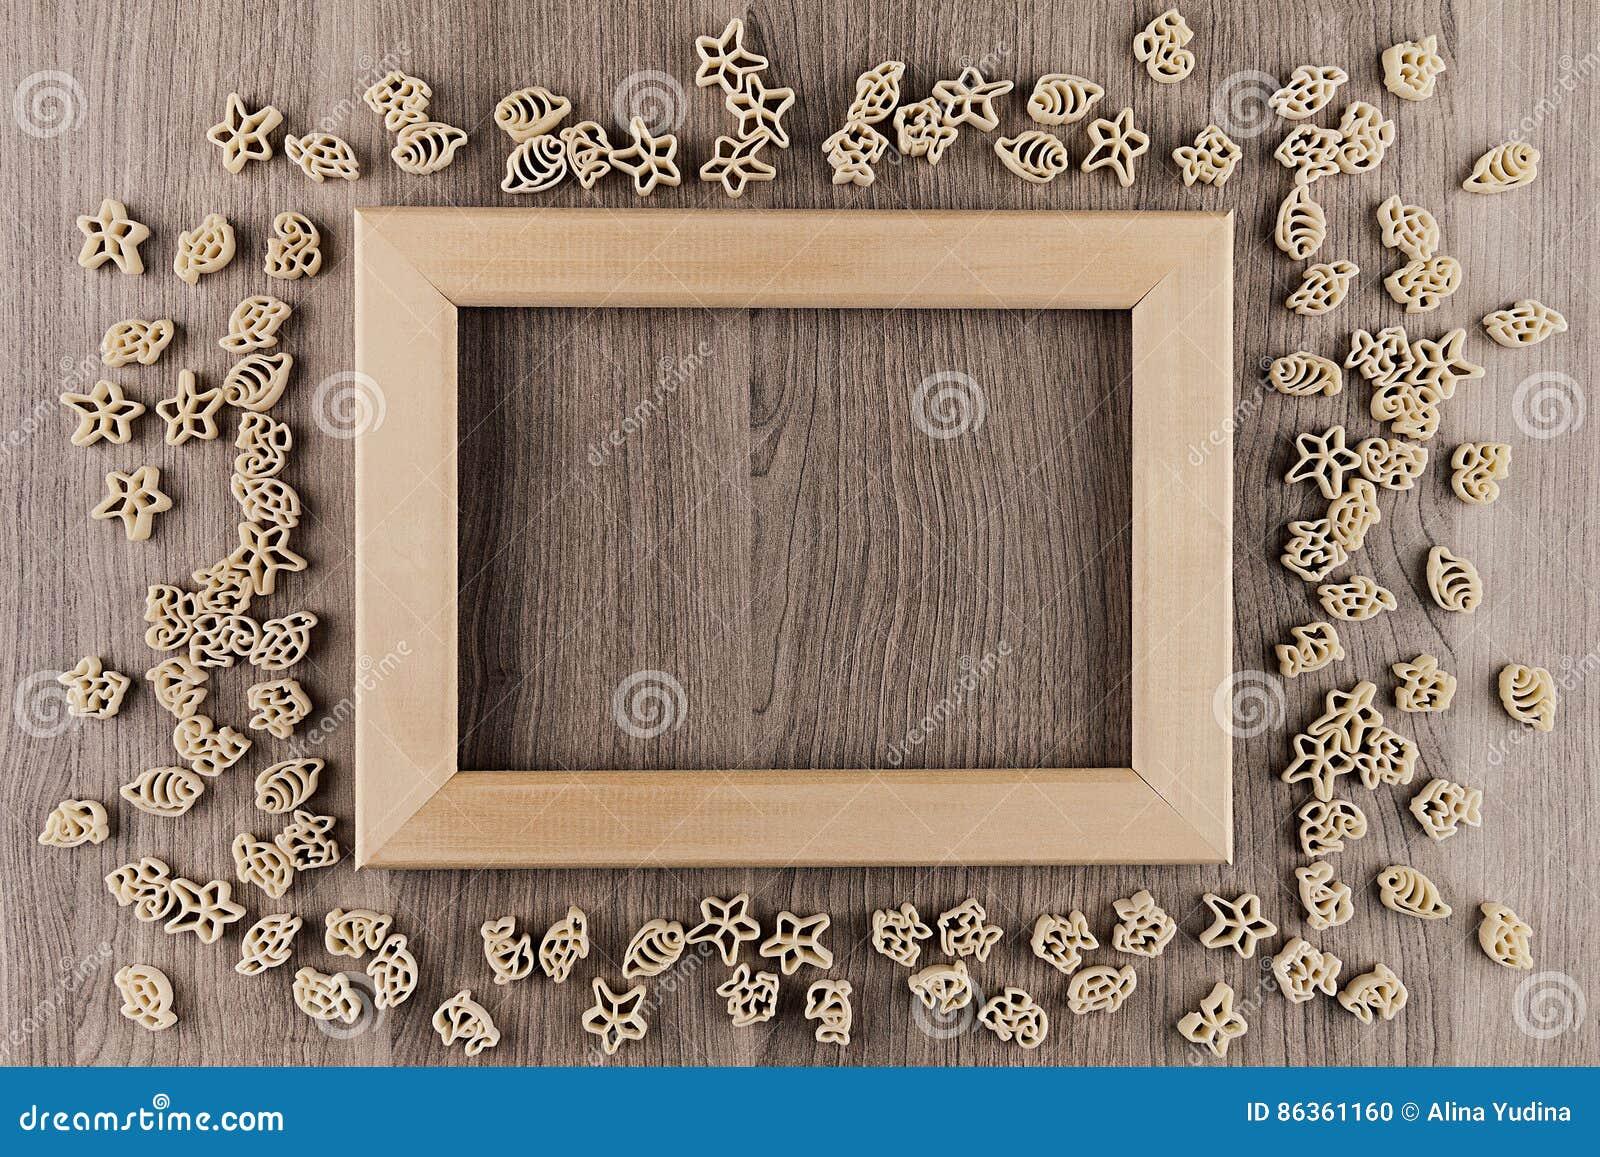 italian dry sea pasta on beige brown wooden board with empty copy